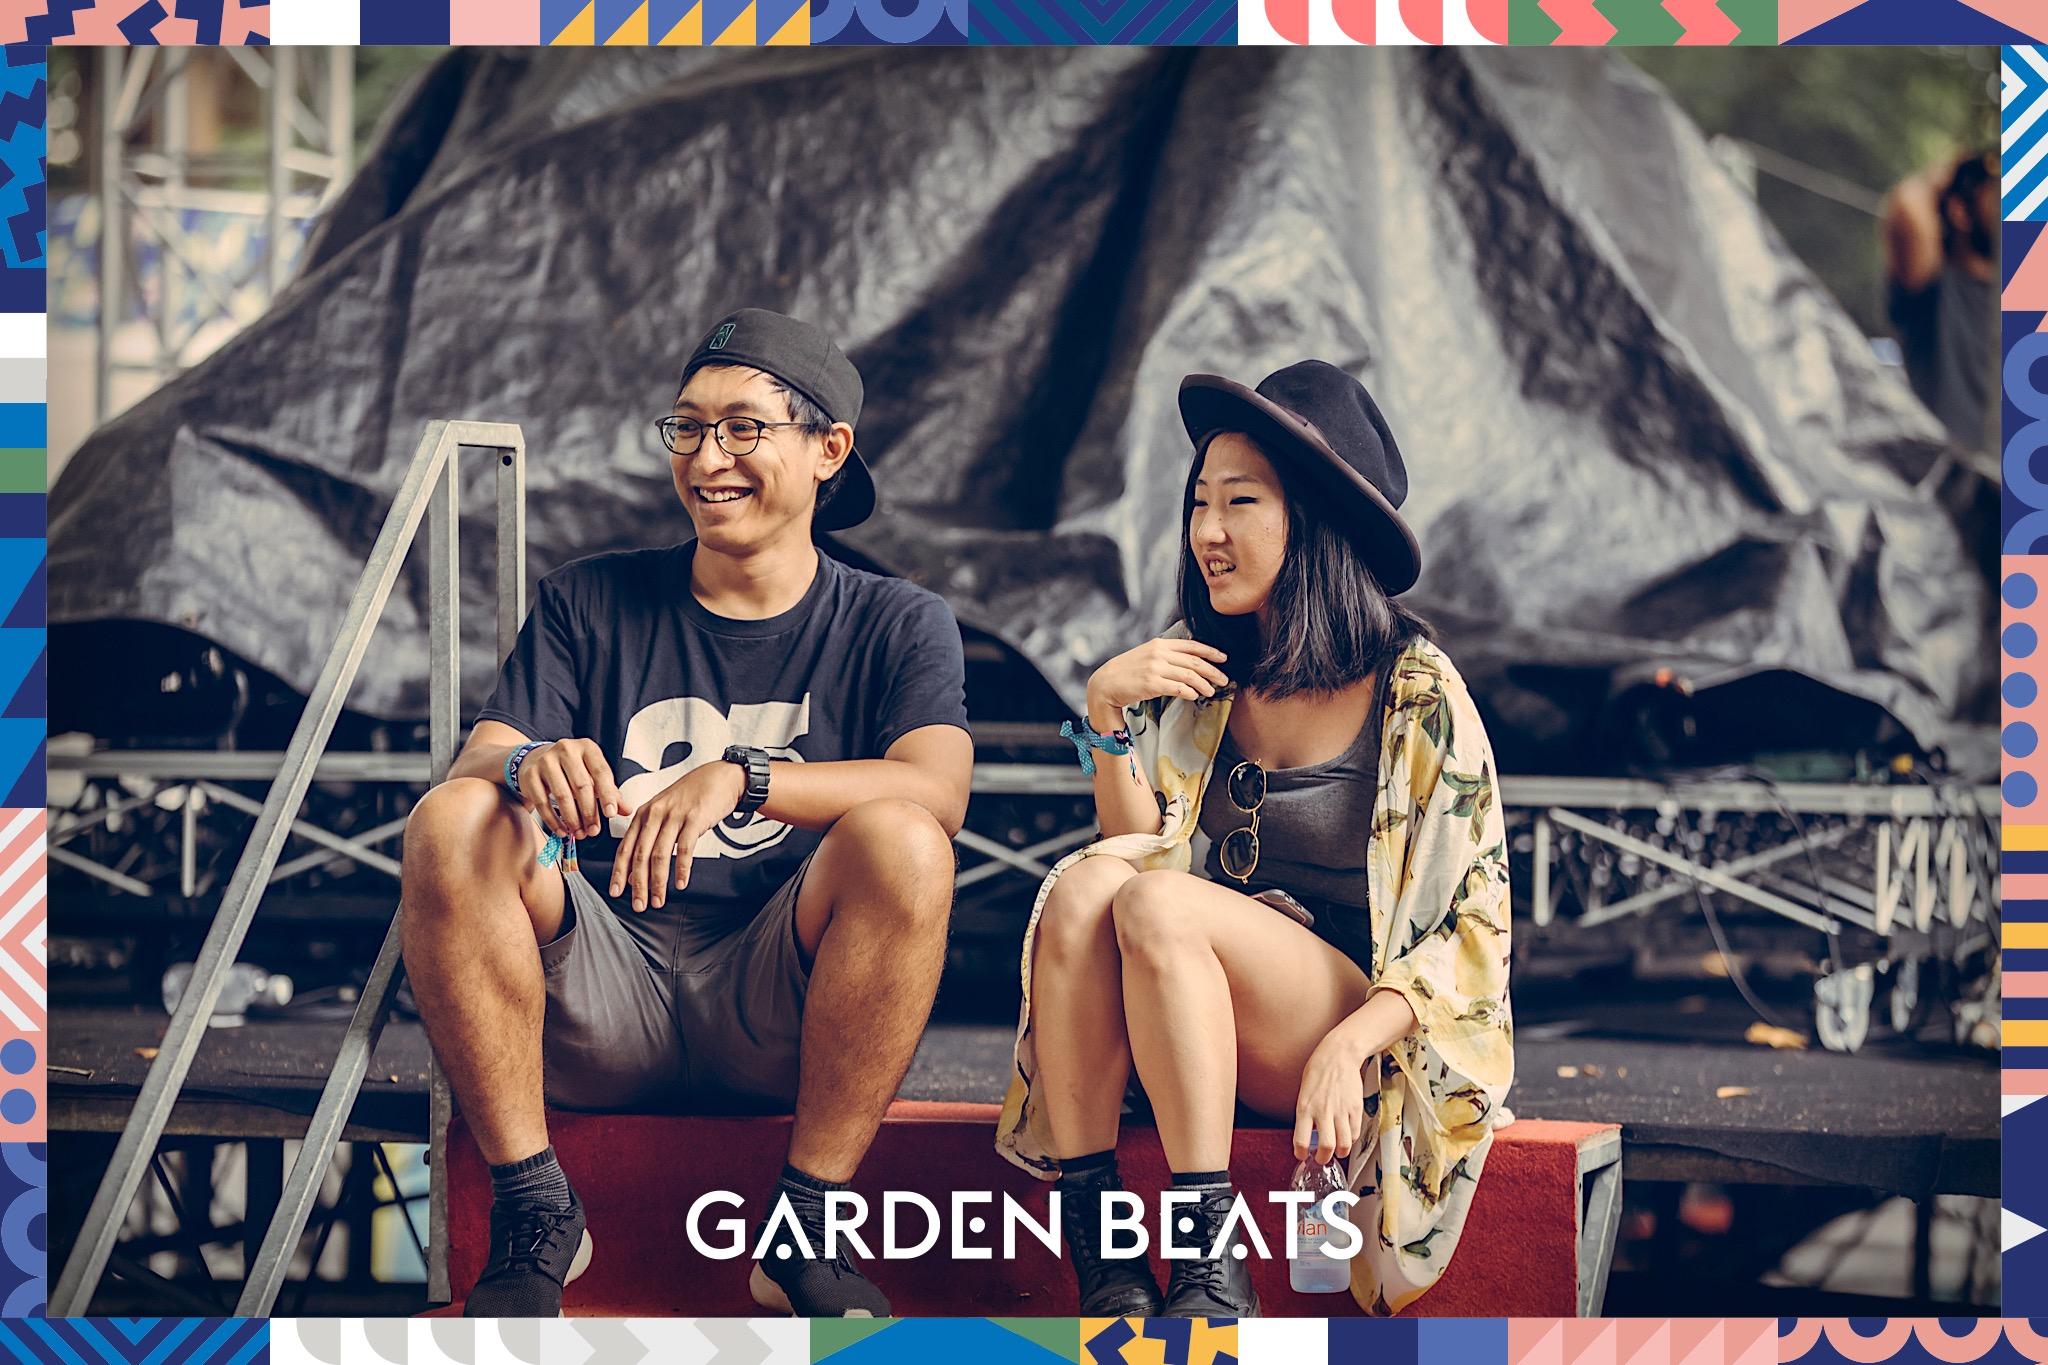 03032018_GardenBeats_Colossal385_Watermarked.jpg